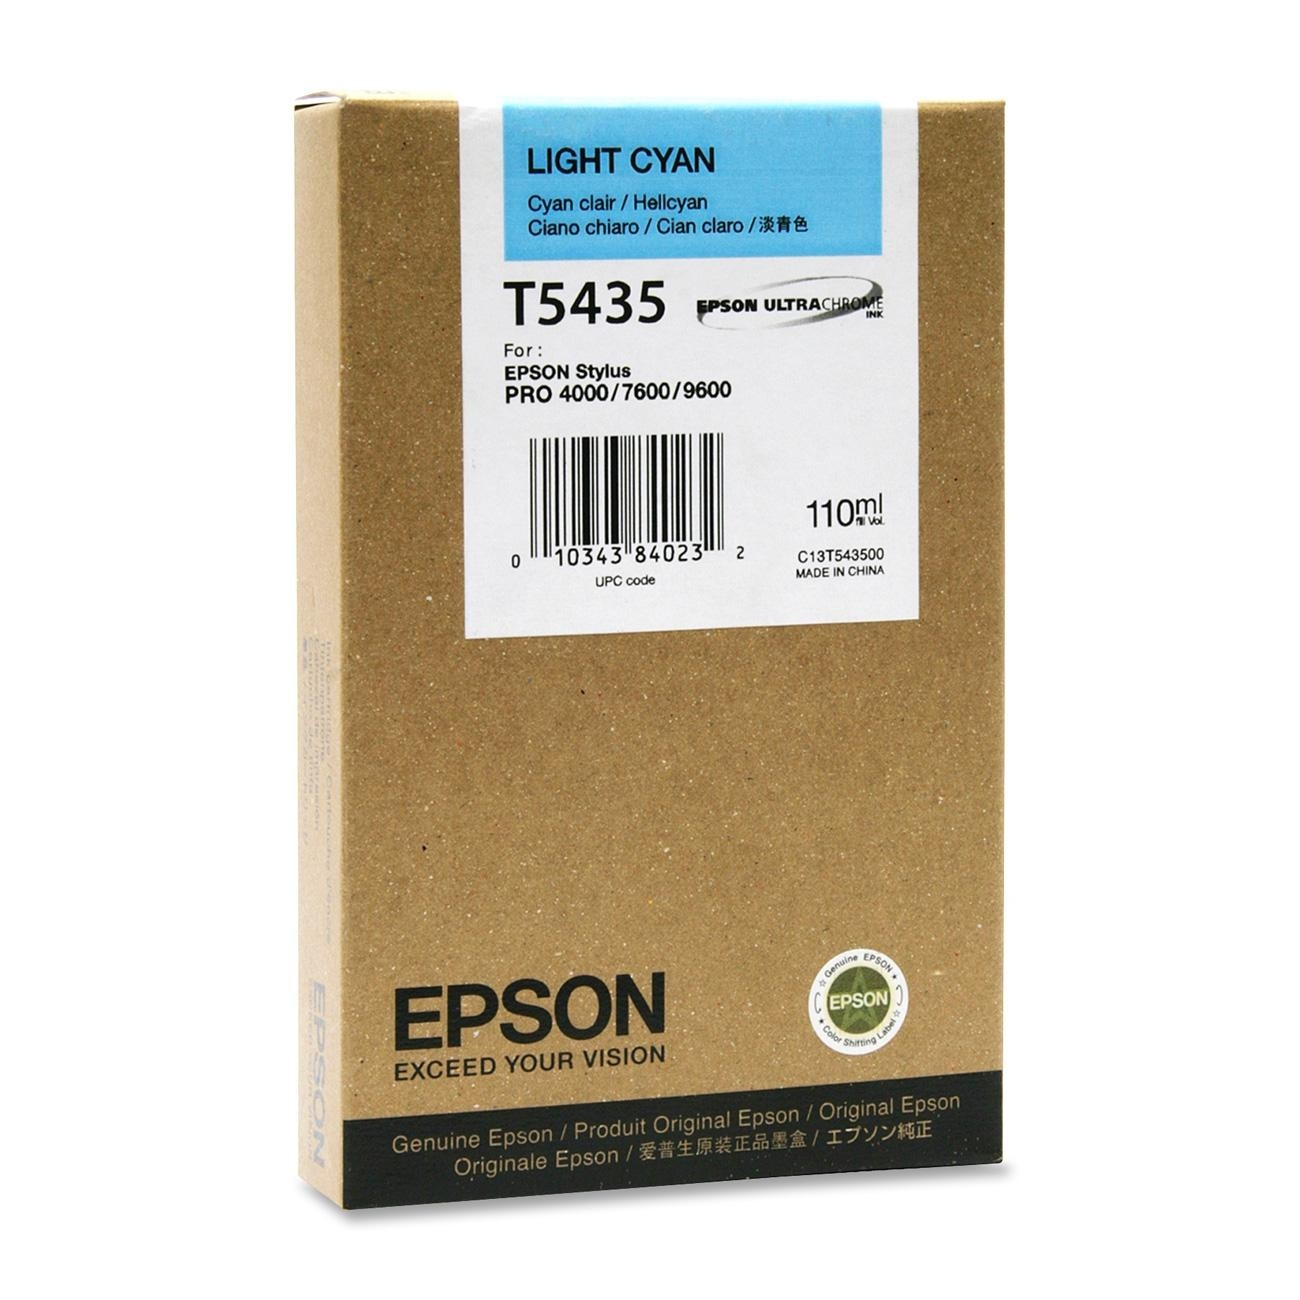 Epson T543500 cartuccia cyano-chiaro, capacit� 110ml